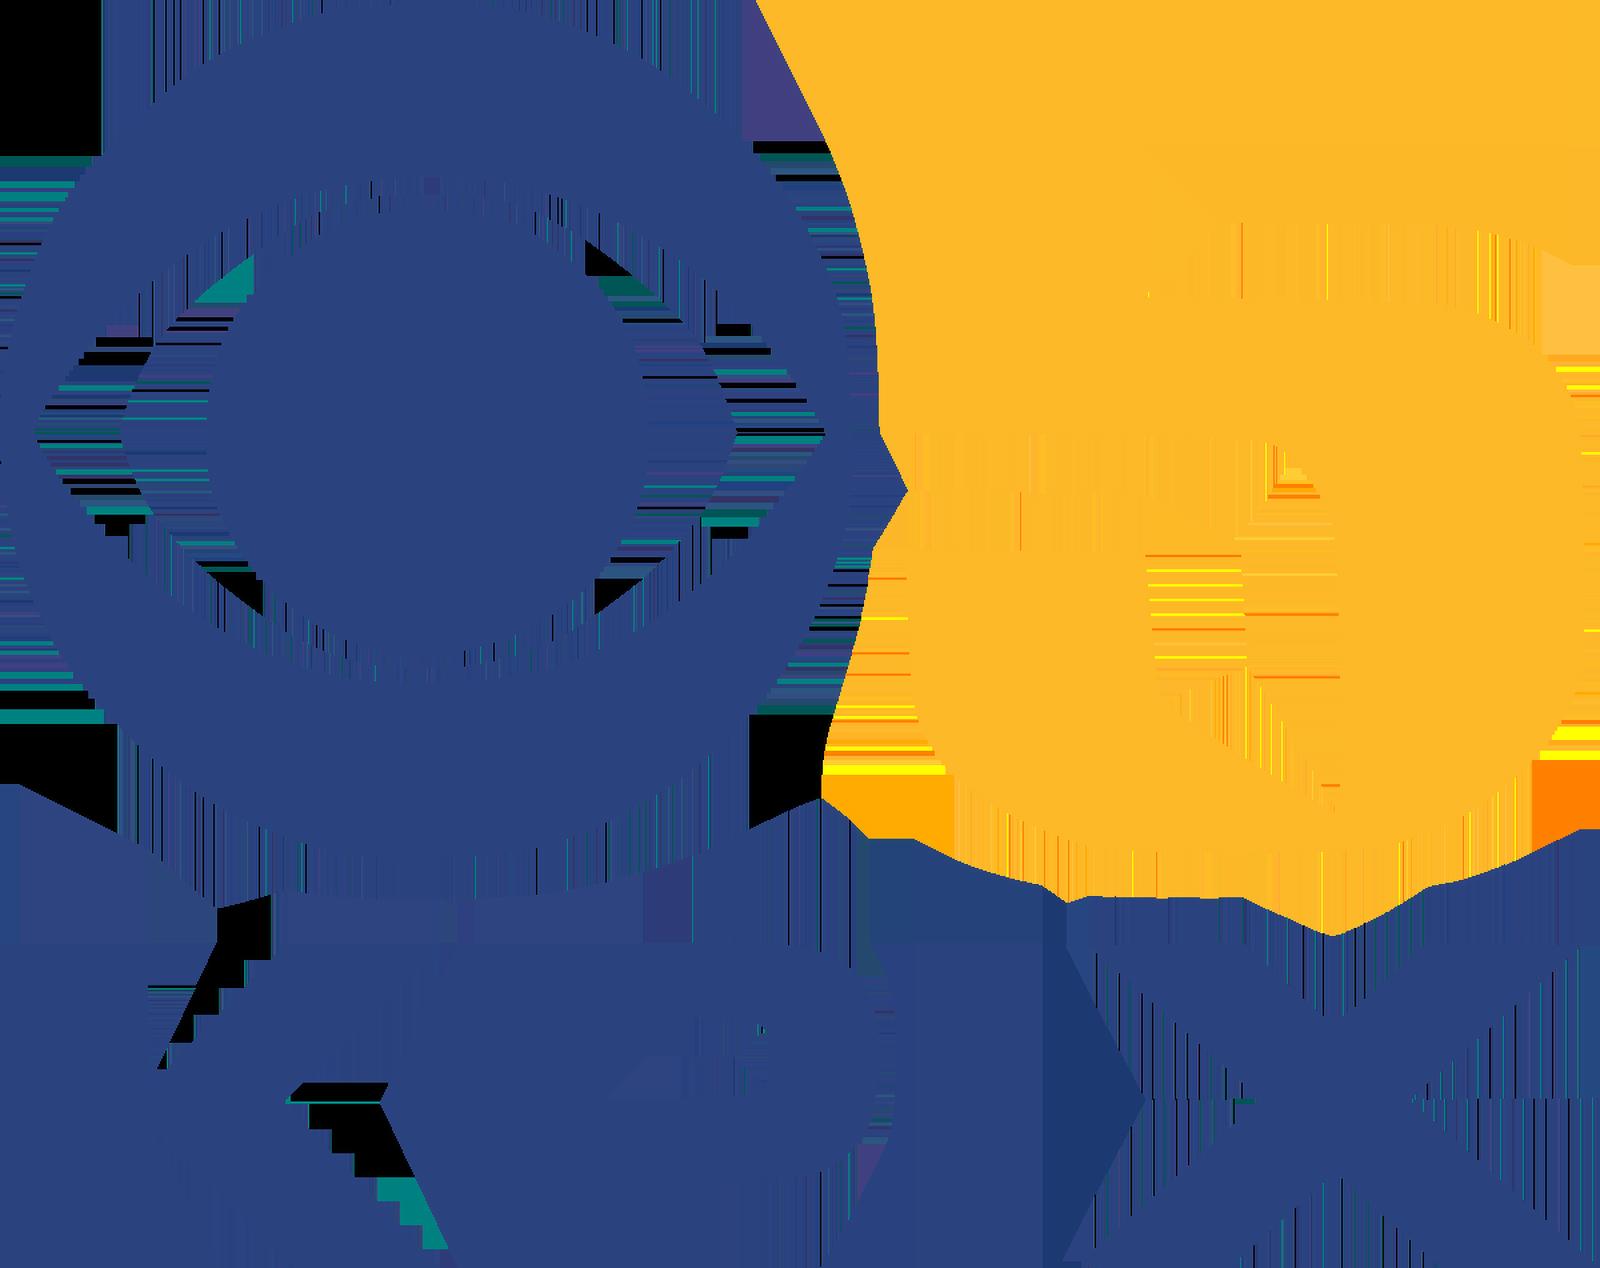 KPIX 5 News San Francisco logo